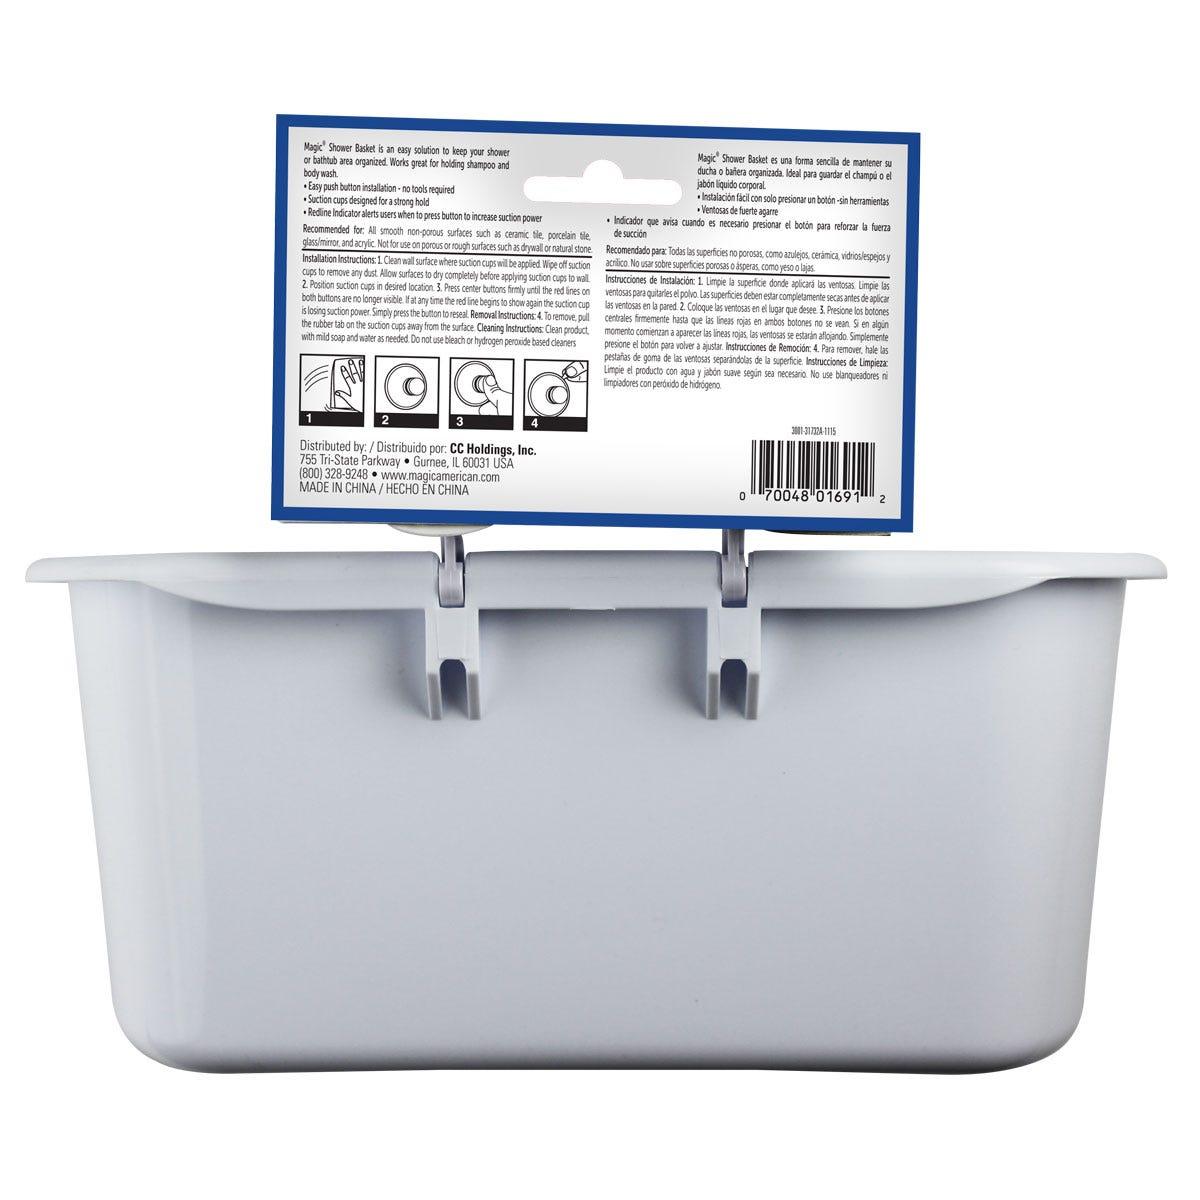 https://googone.com/media/catalog/product/m/a/magic-shower-basket_back.jpg